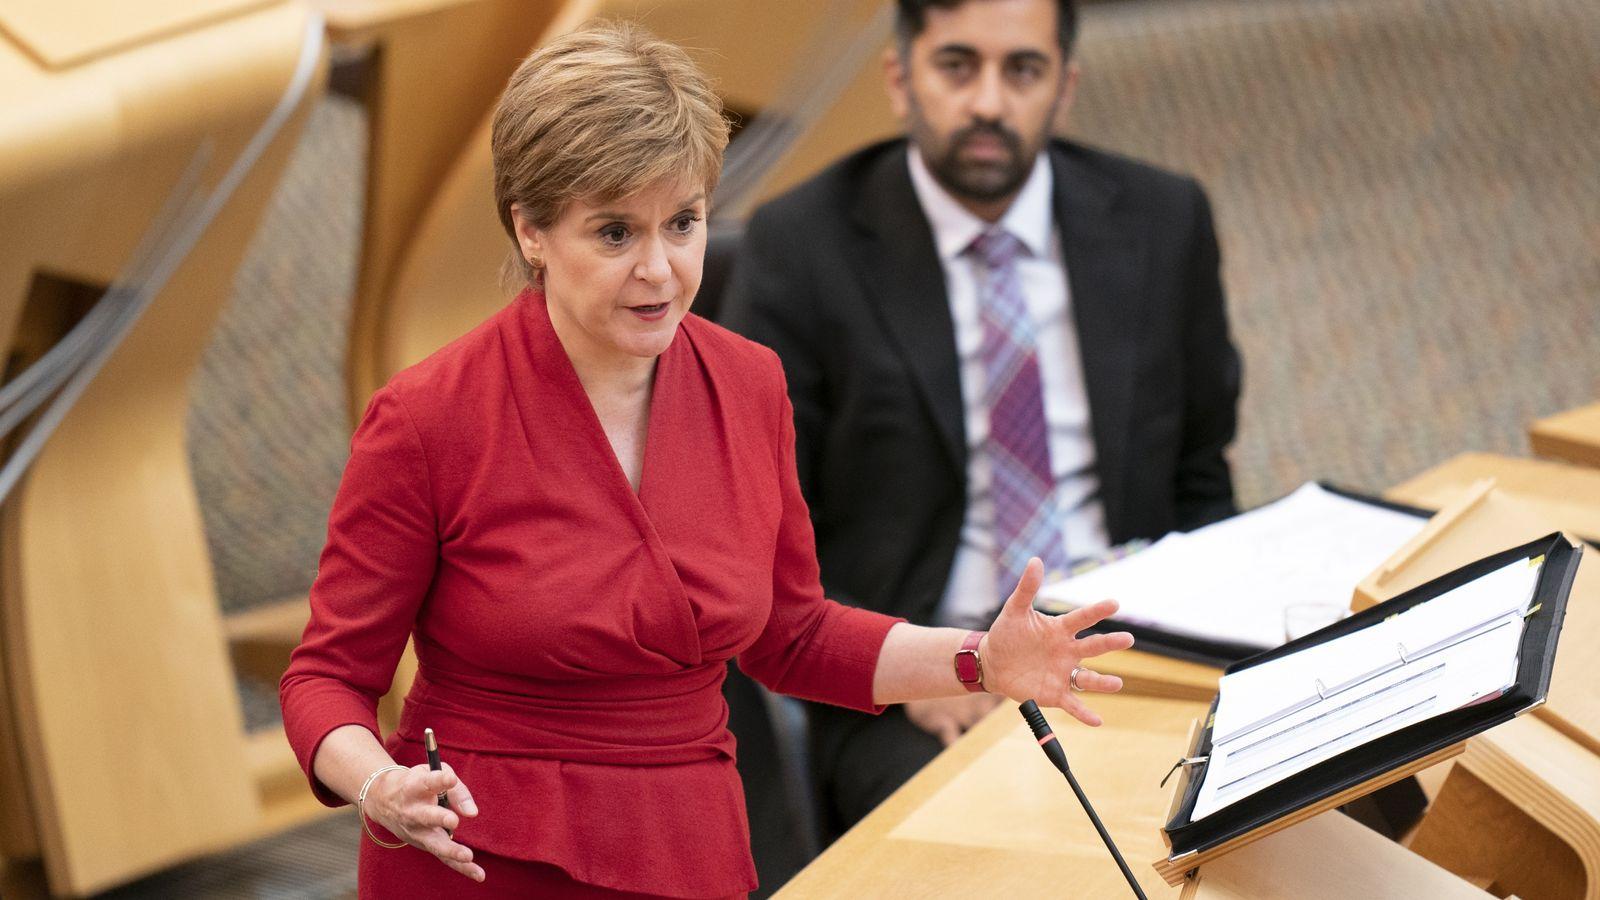 Nicola Sturgeon won't call new Scotland independence vote until COVID 'under control'